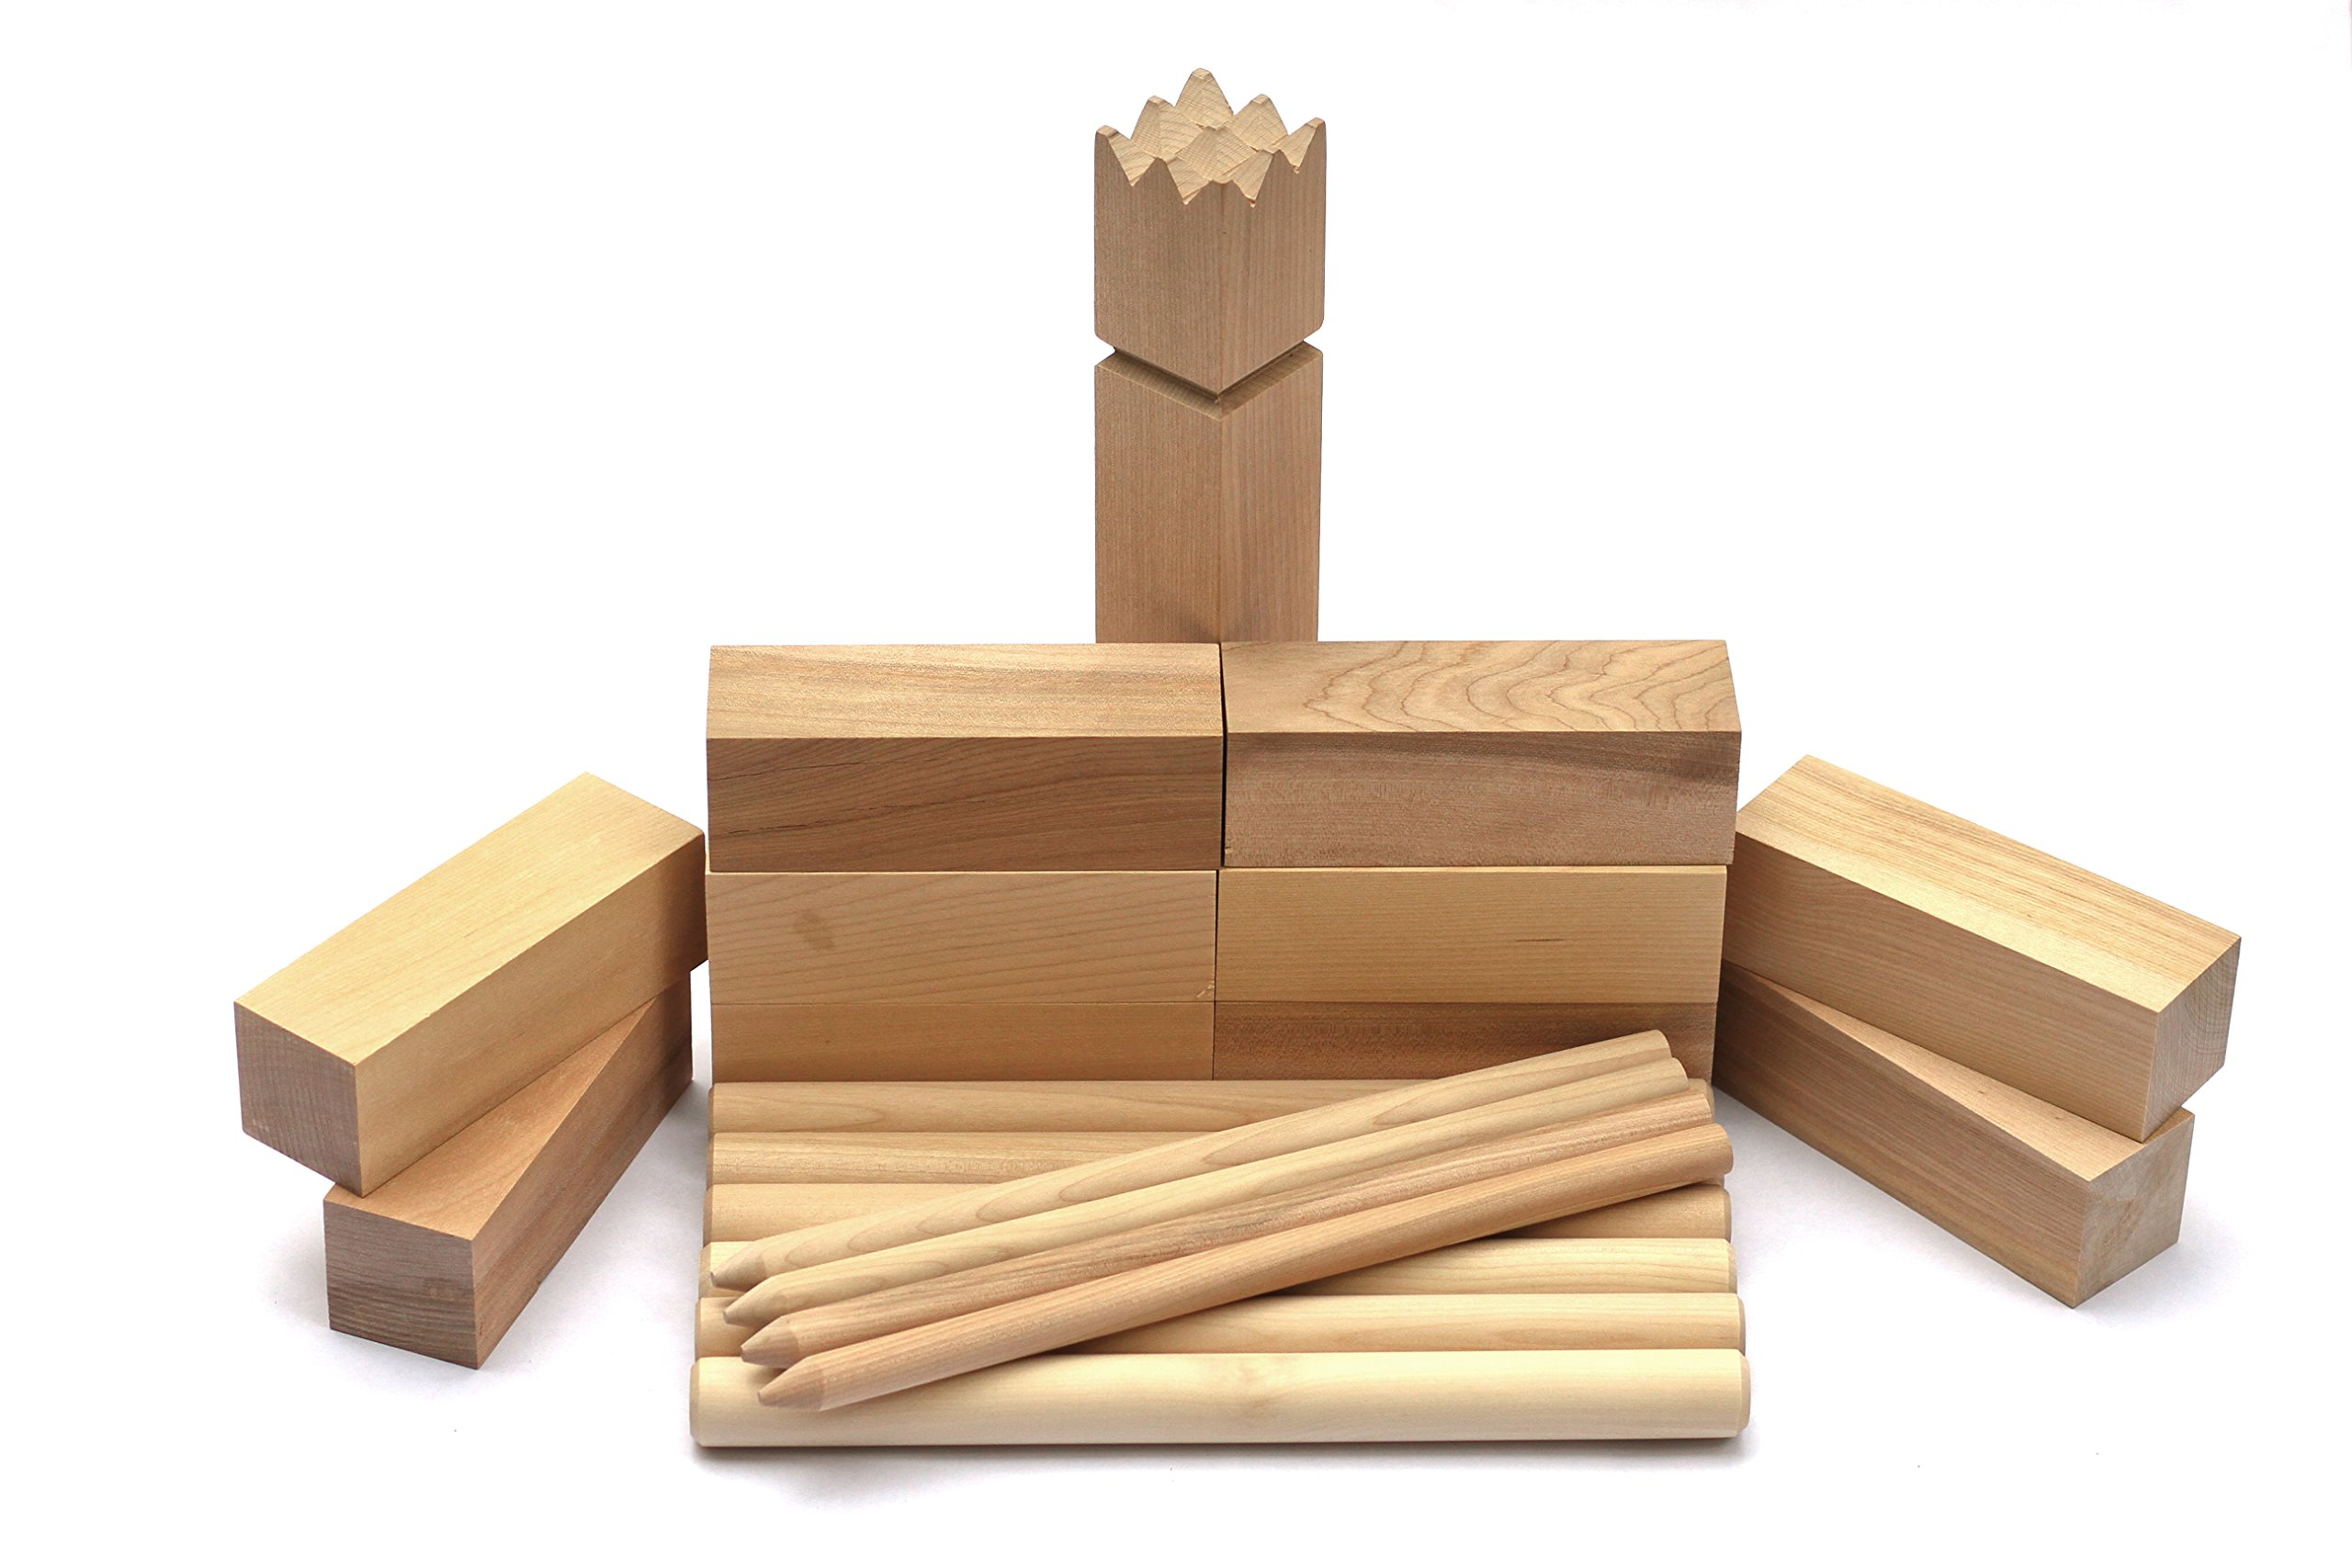 KOOB The Viking Game - hardwood kubb game set product image